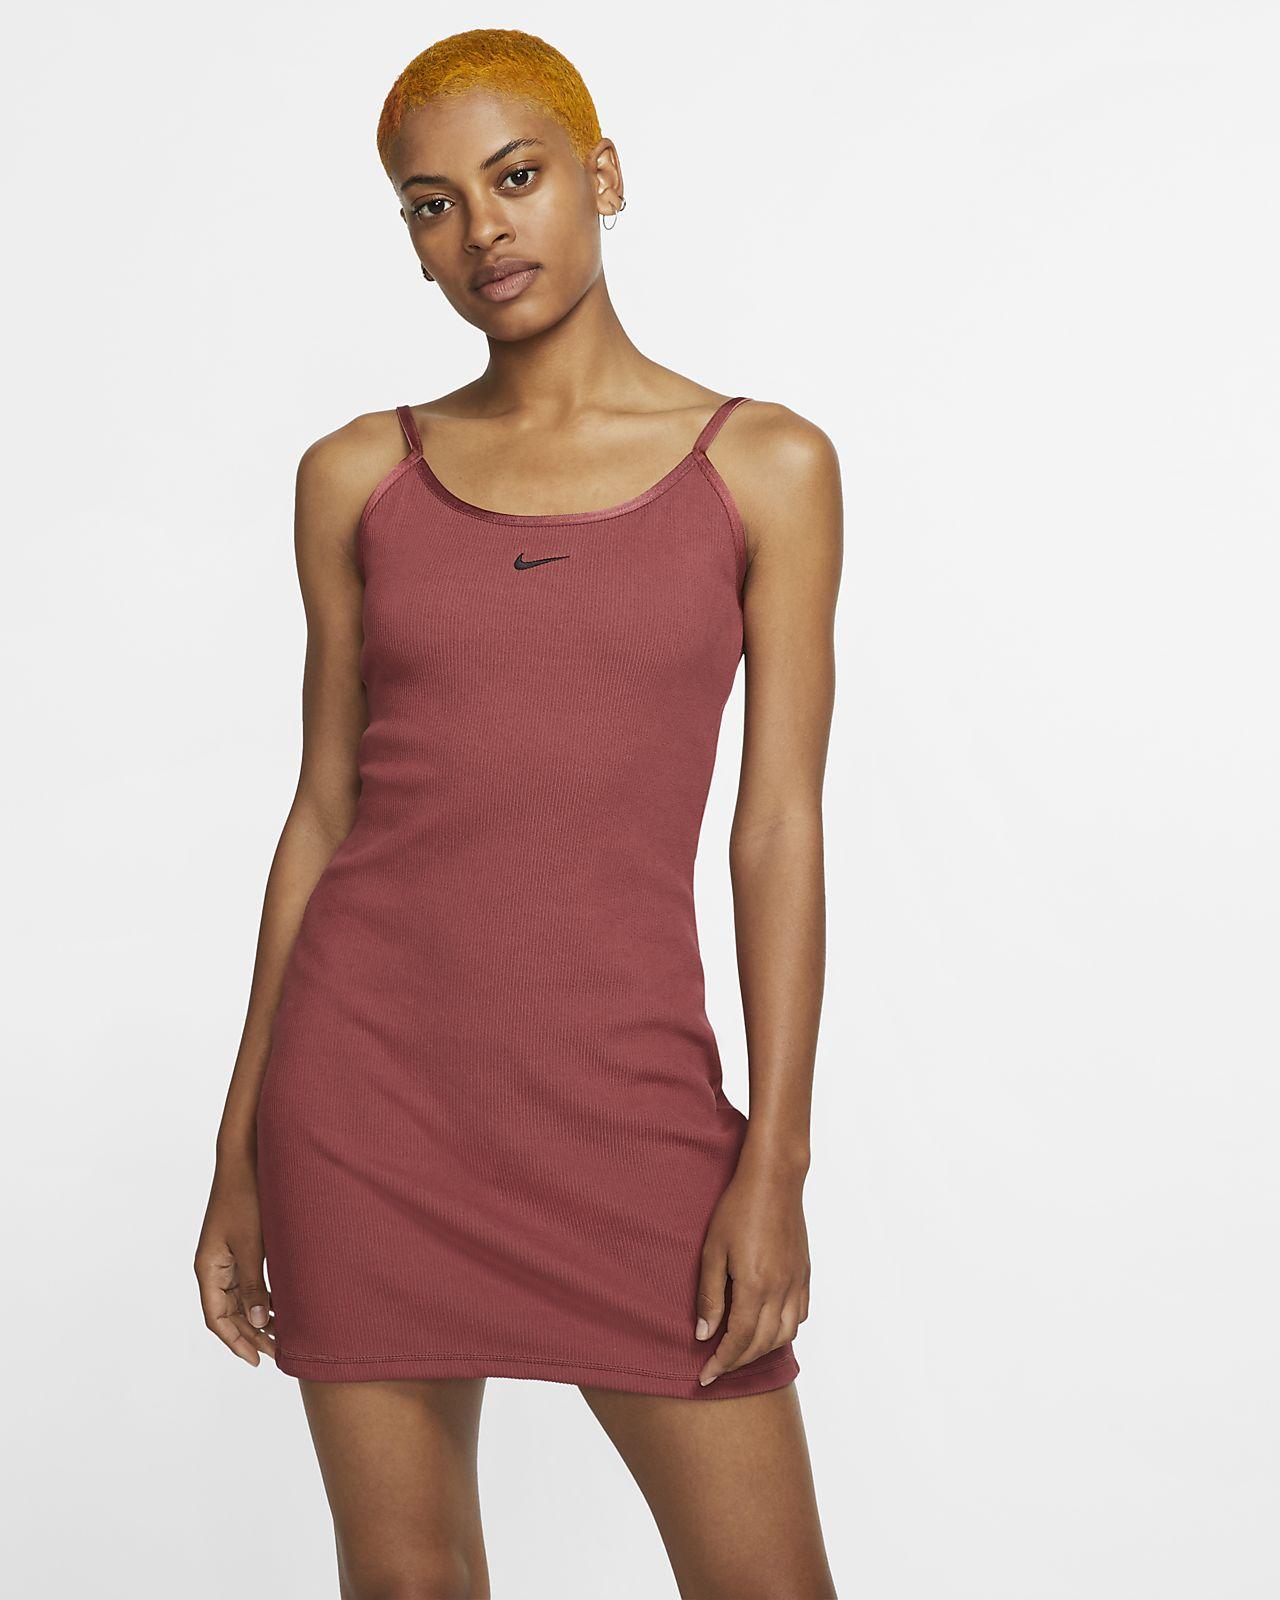 Nike Sportswear geripptes JDI-Kleid für Damen